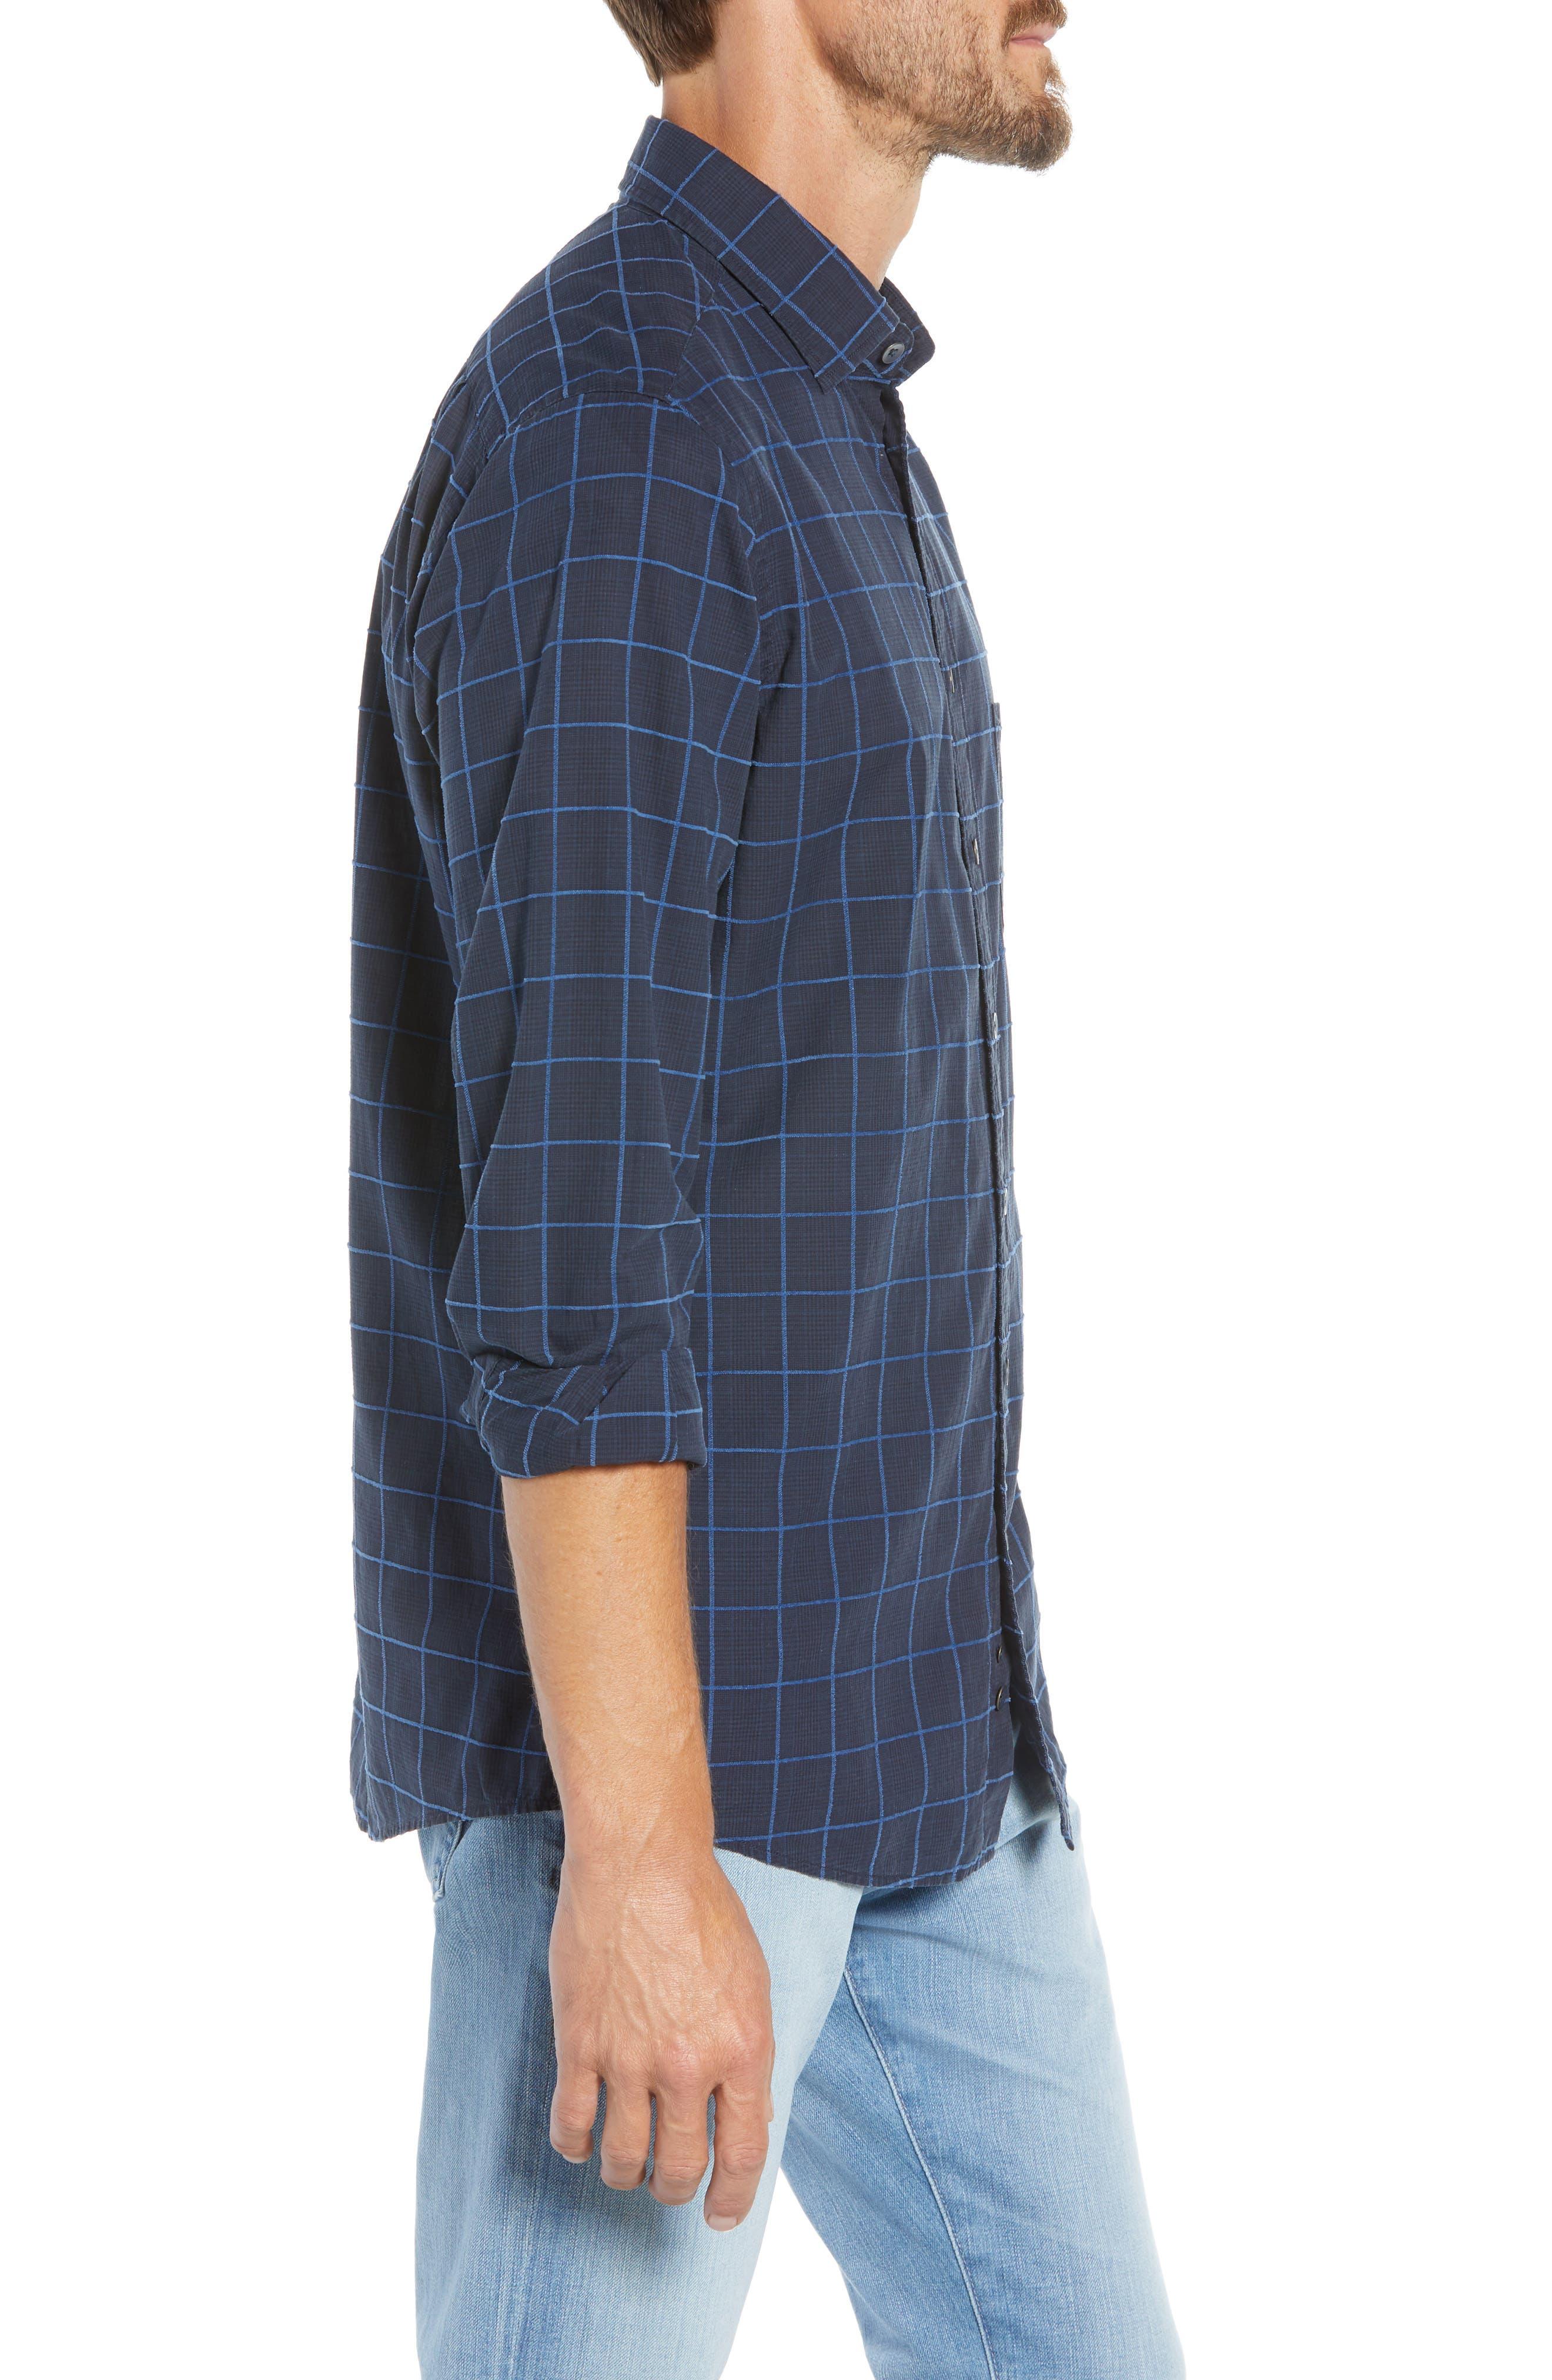 RODD & GUNN, Hindley Creek Regular Fit Sport Shirt, Alternate thumbnail 4, color, NAVY